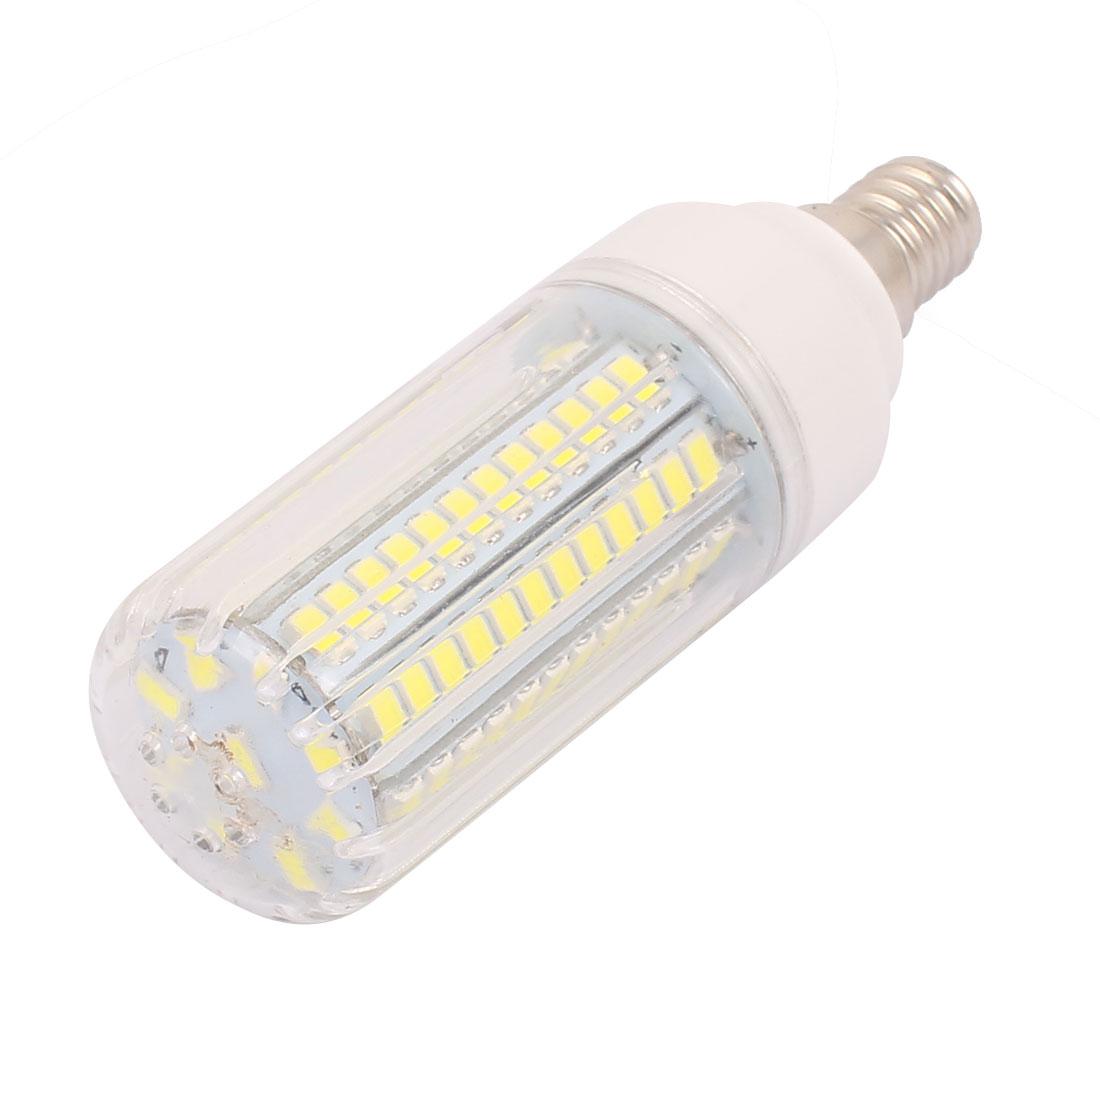 AC110V 9W 96 x 5736SMD E14 LED Corn Bulb Light Lamp Energy Saving Pure White